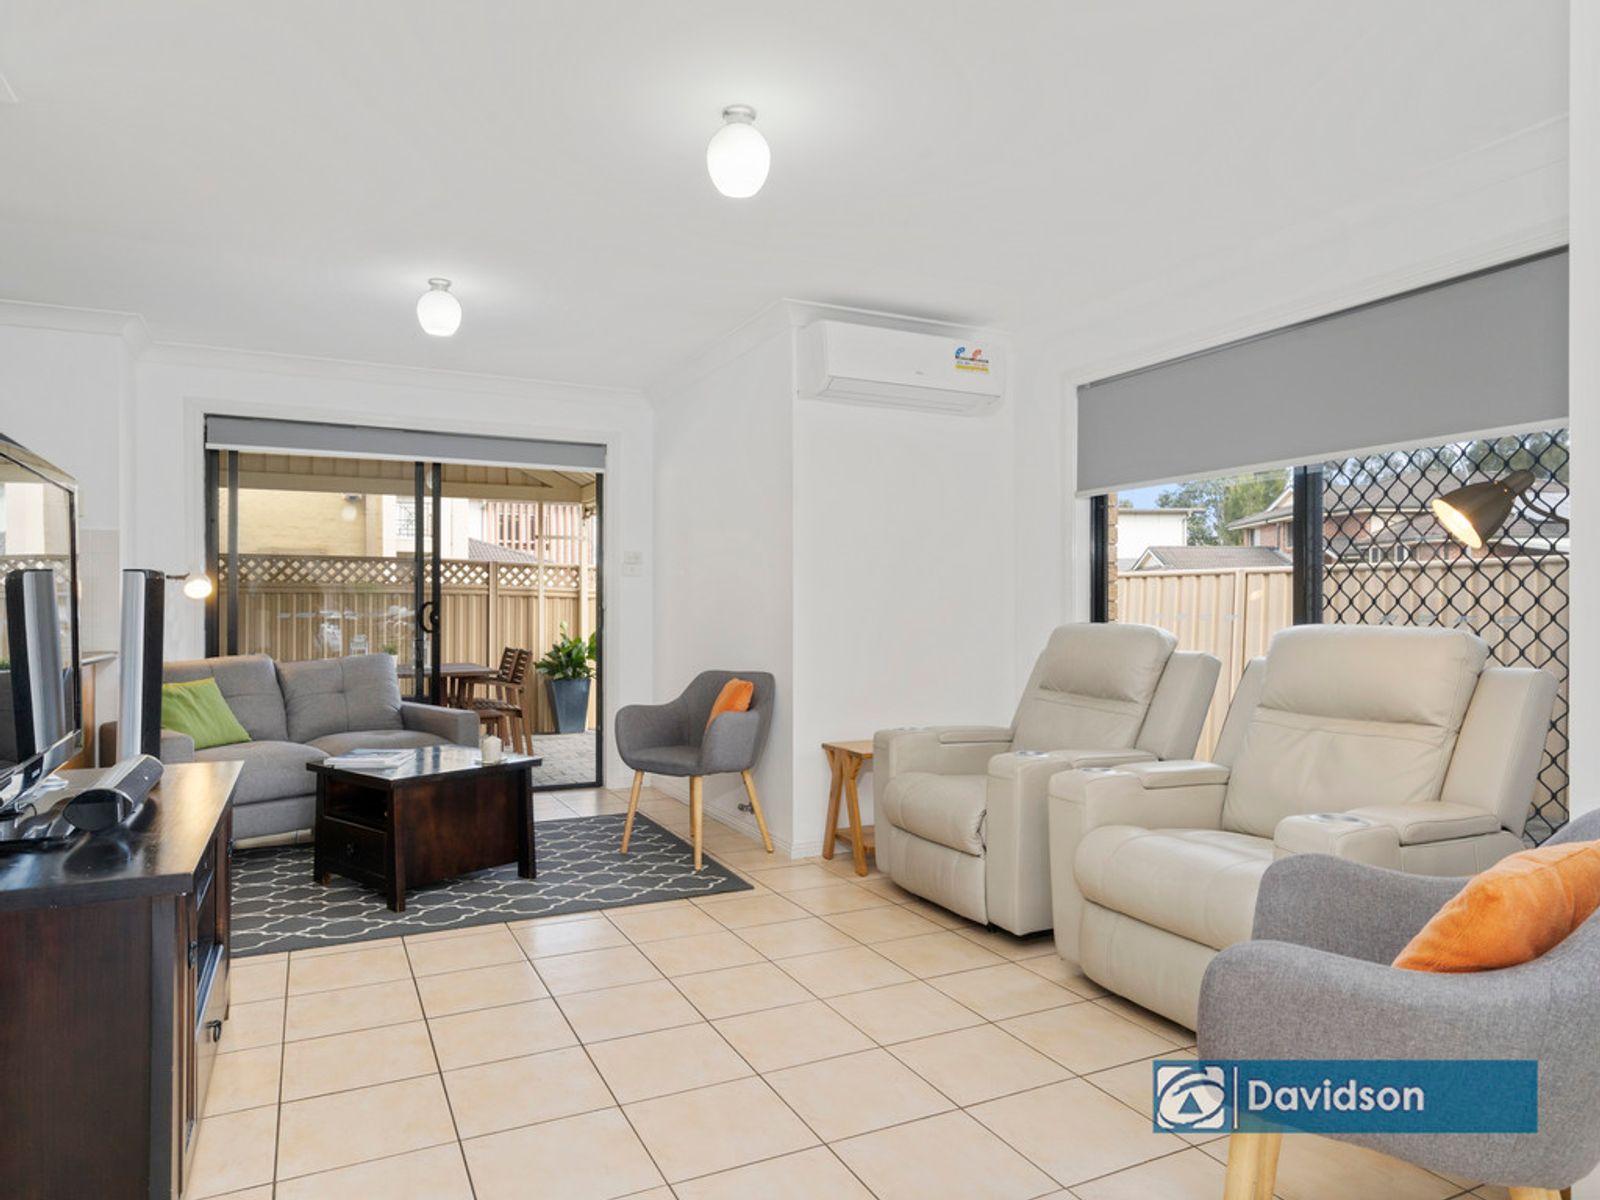 2A Mondovi Close, Prestons, NSW 2170